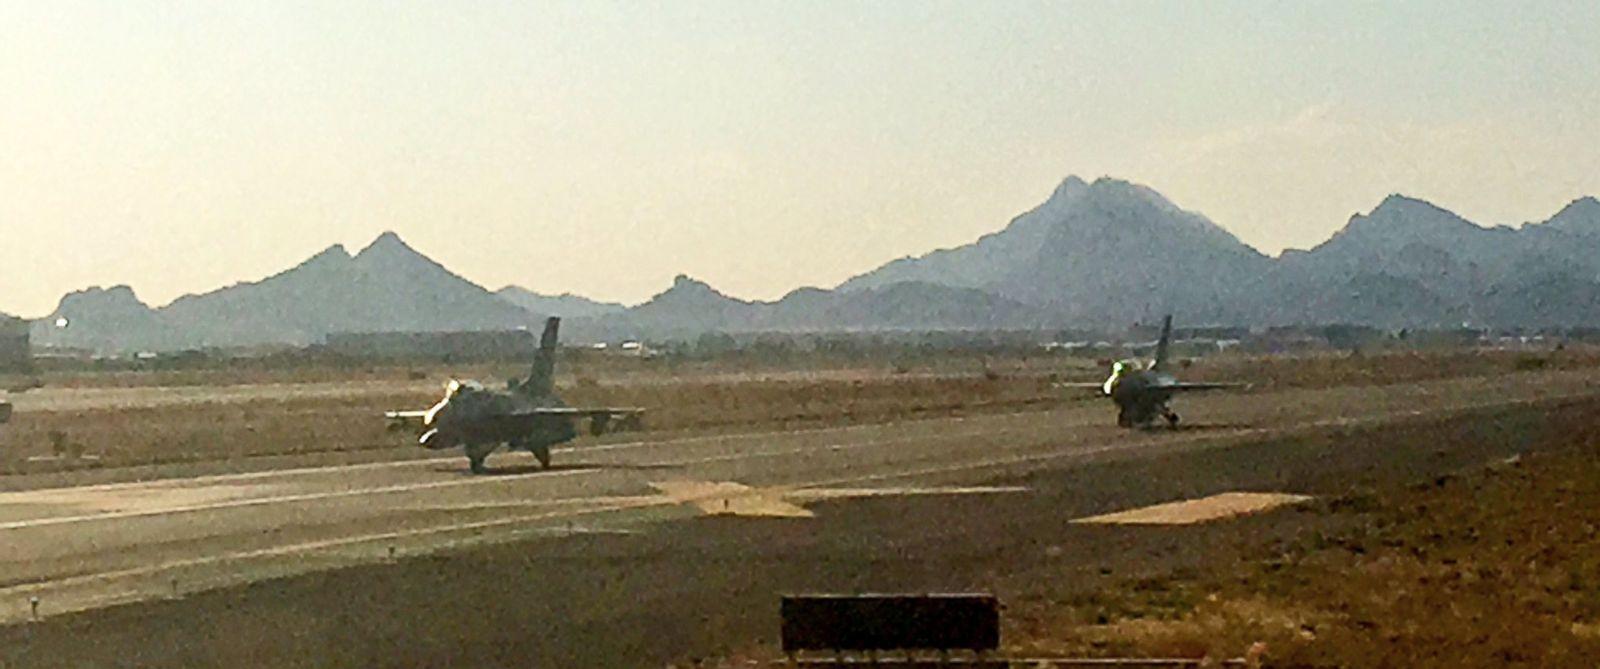 news fighter jets escort diverted delta flight tucson